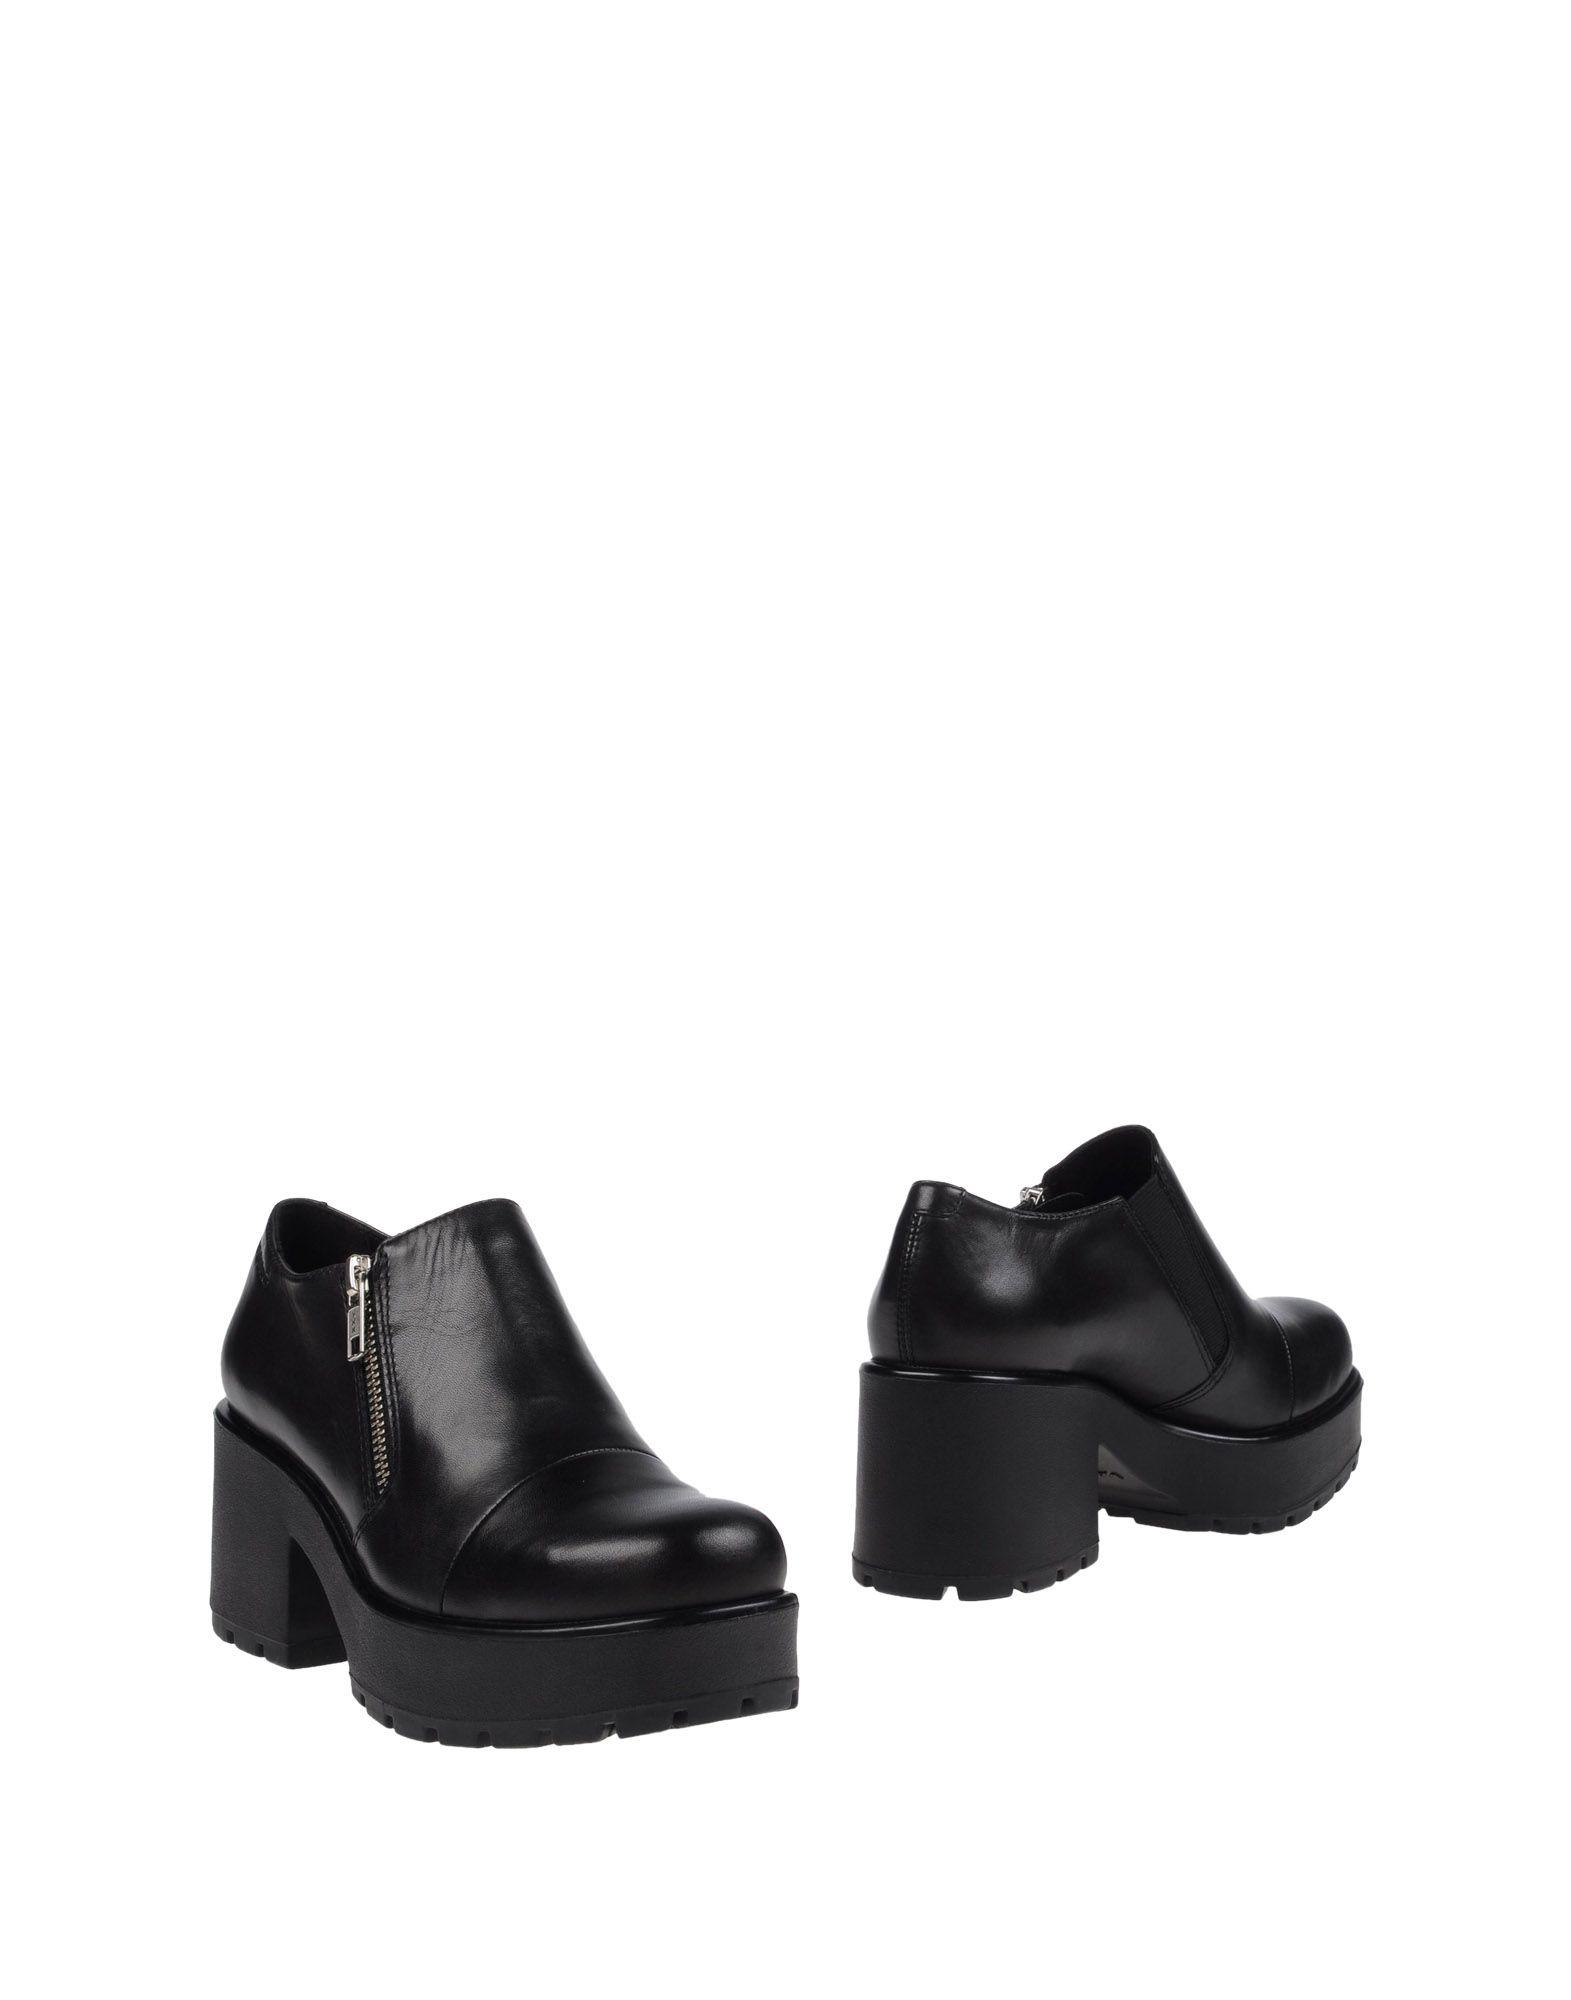 VAGABOND SHOEMAKERS Ботинки vagabond shoemakers полусапоги и высокие ботинки